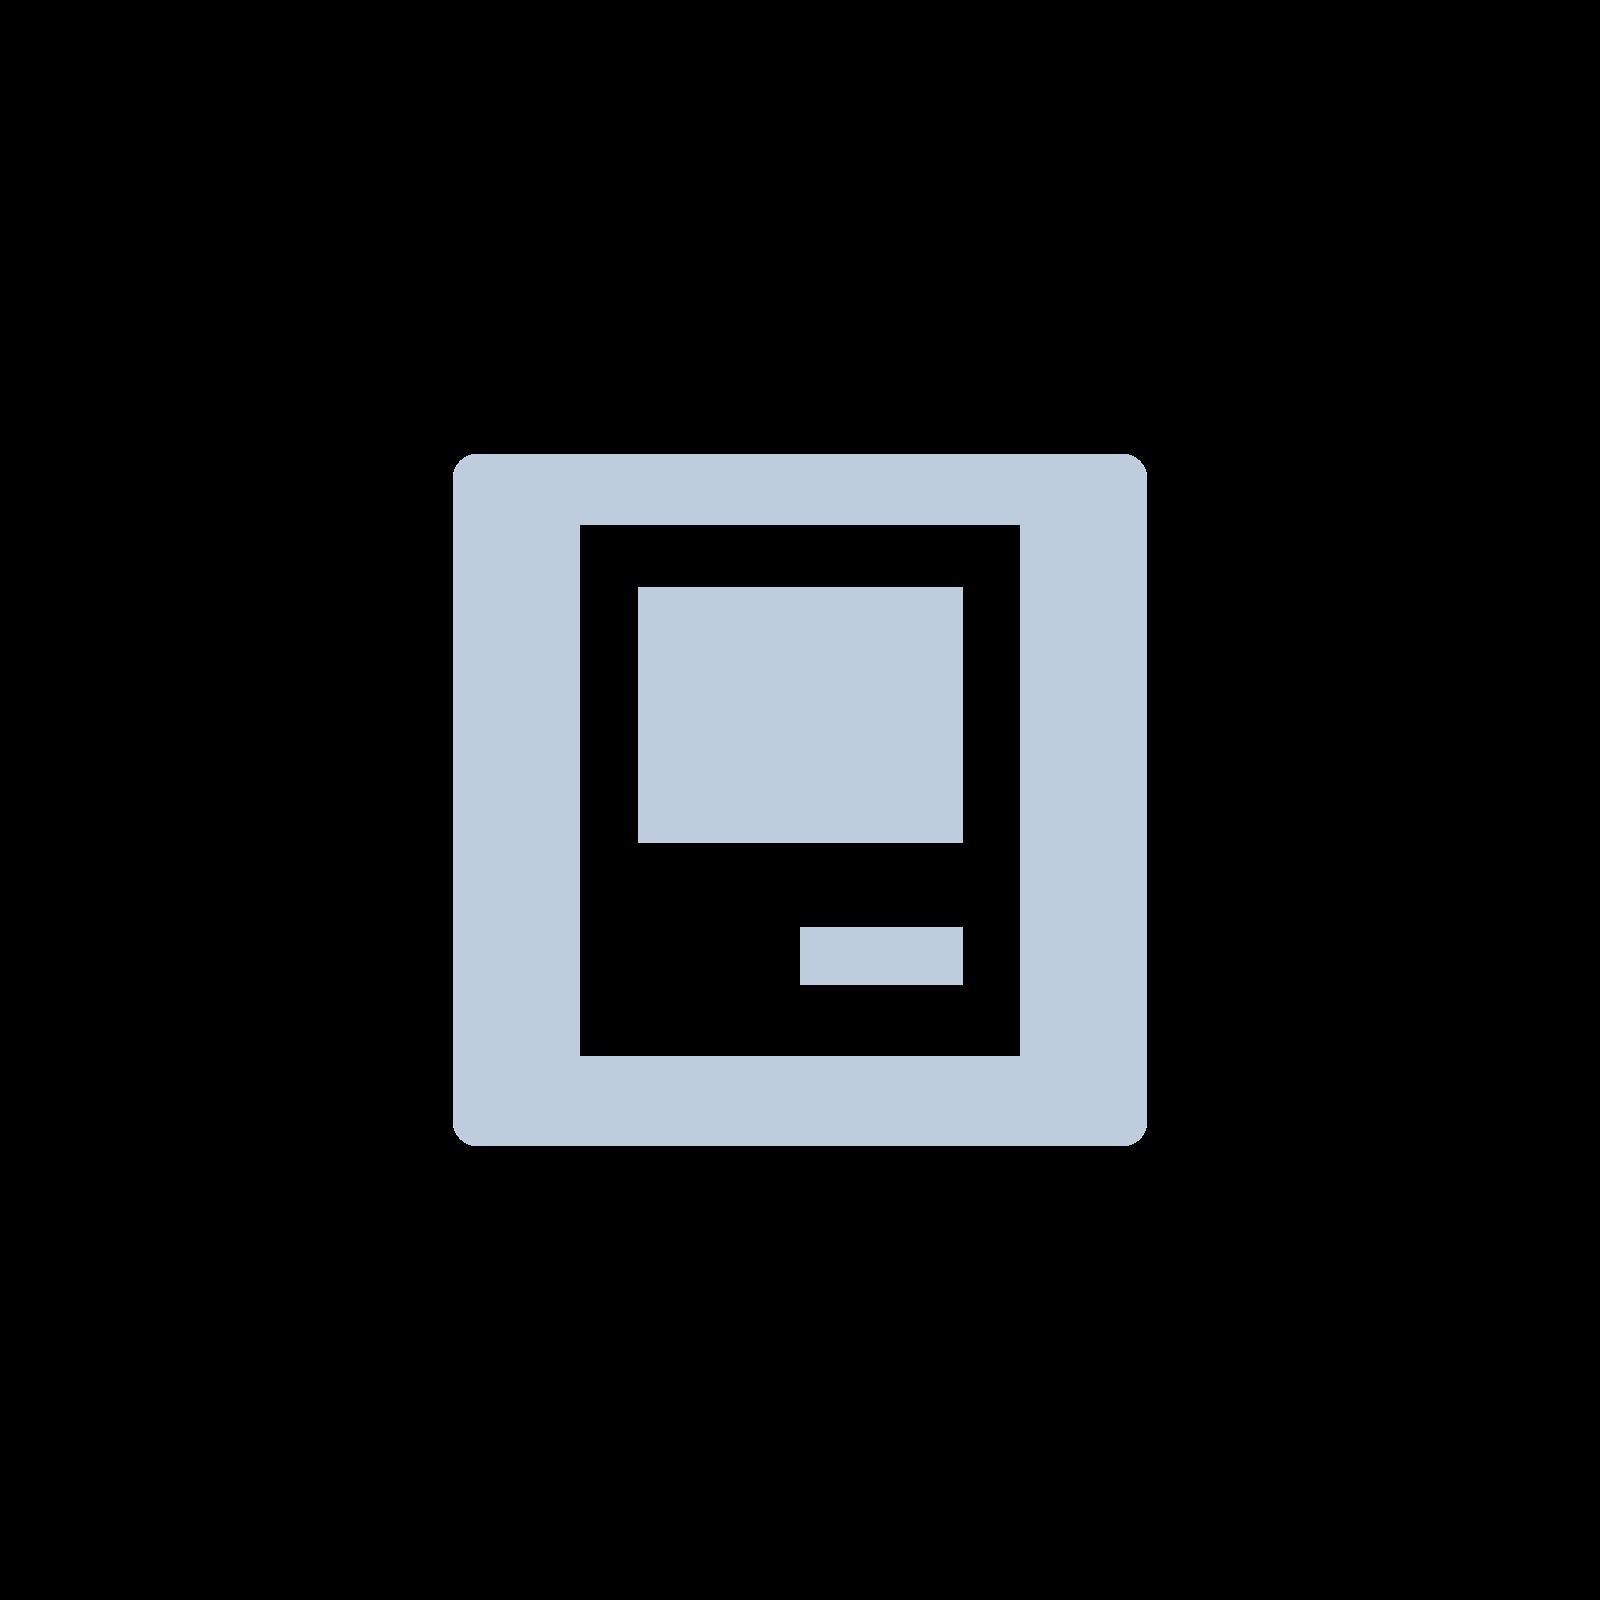 jetzt gebrauchtes apple ipad mini kaufen maconline. Black Bedroom Furniture Sets. Home Design Ideas